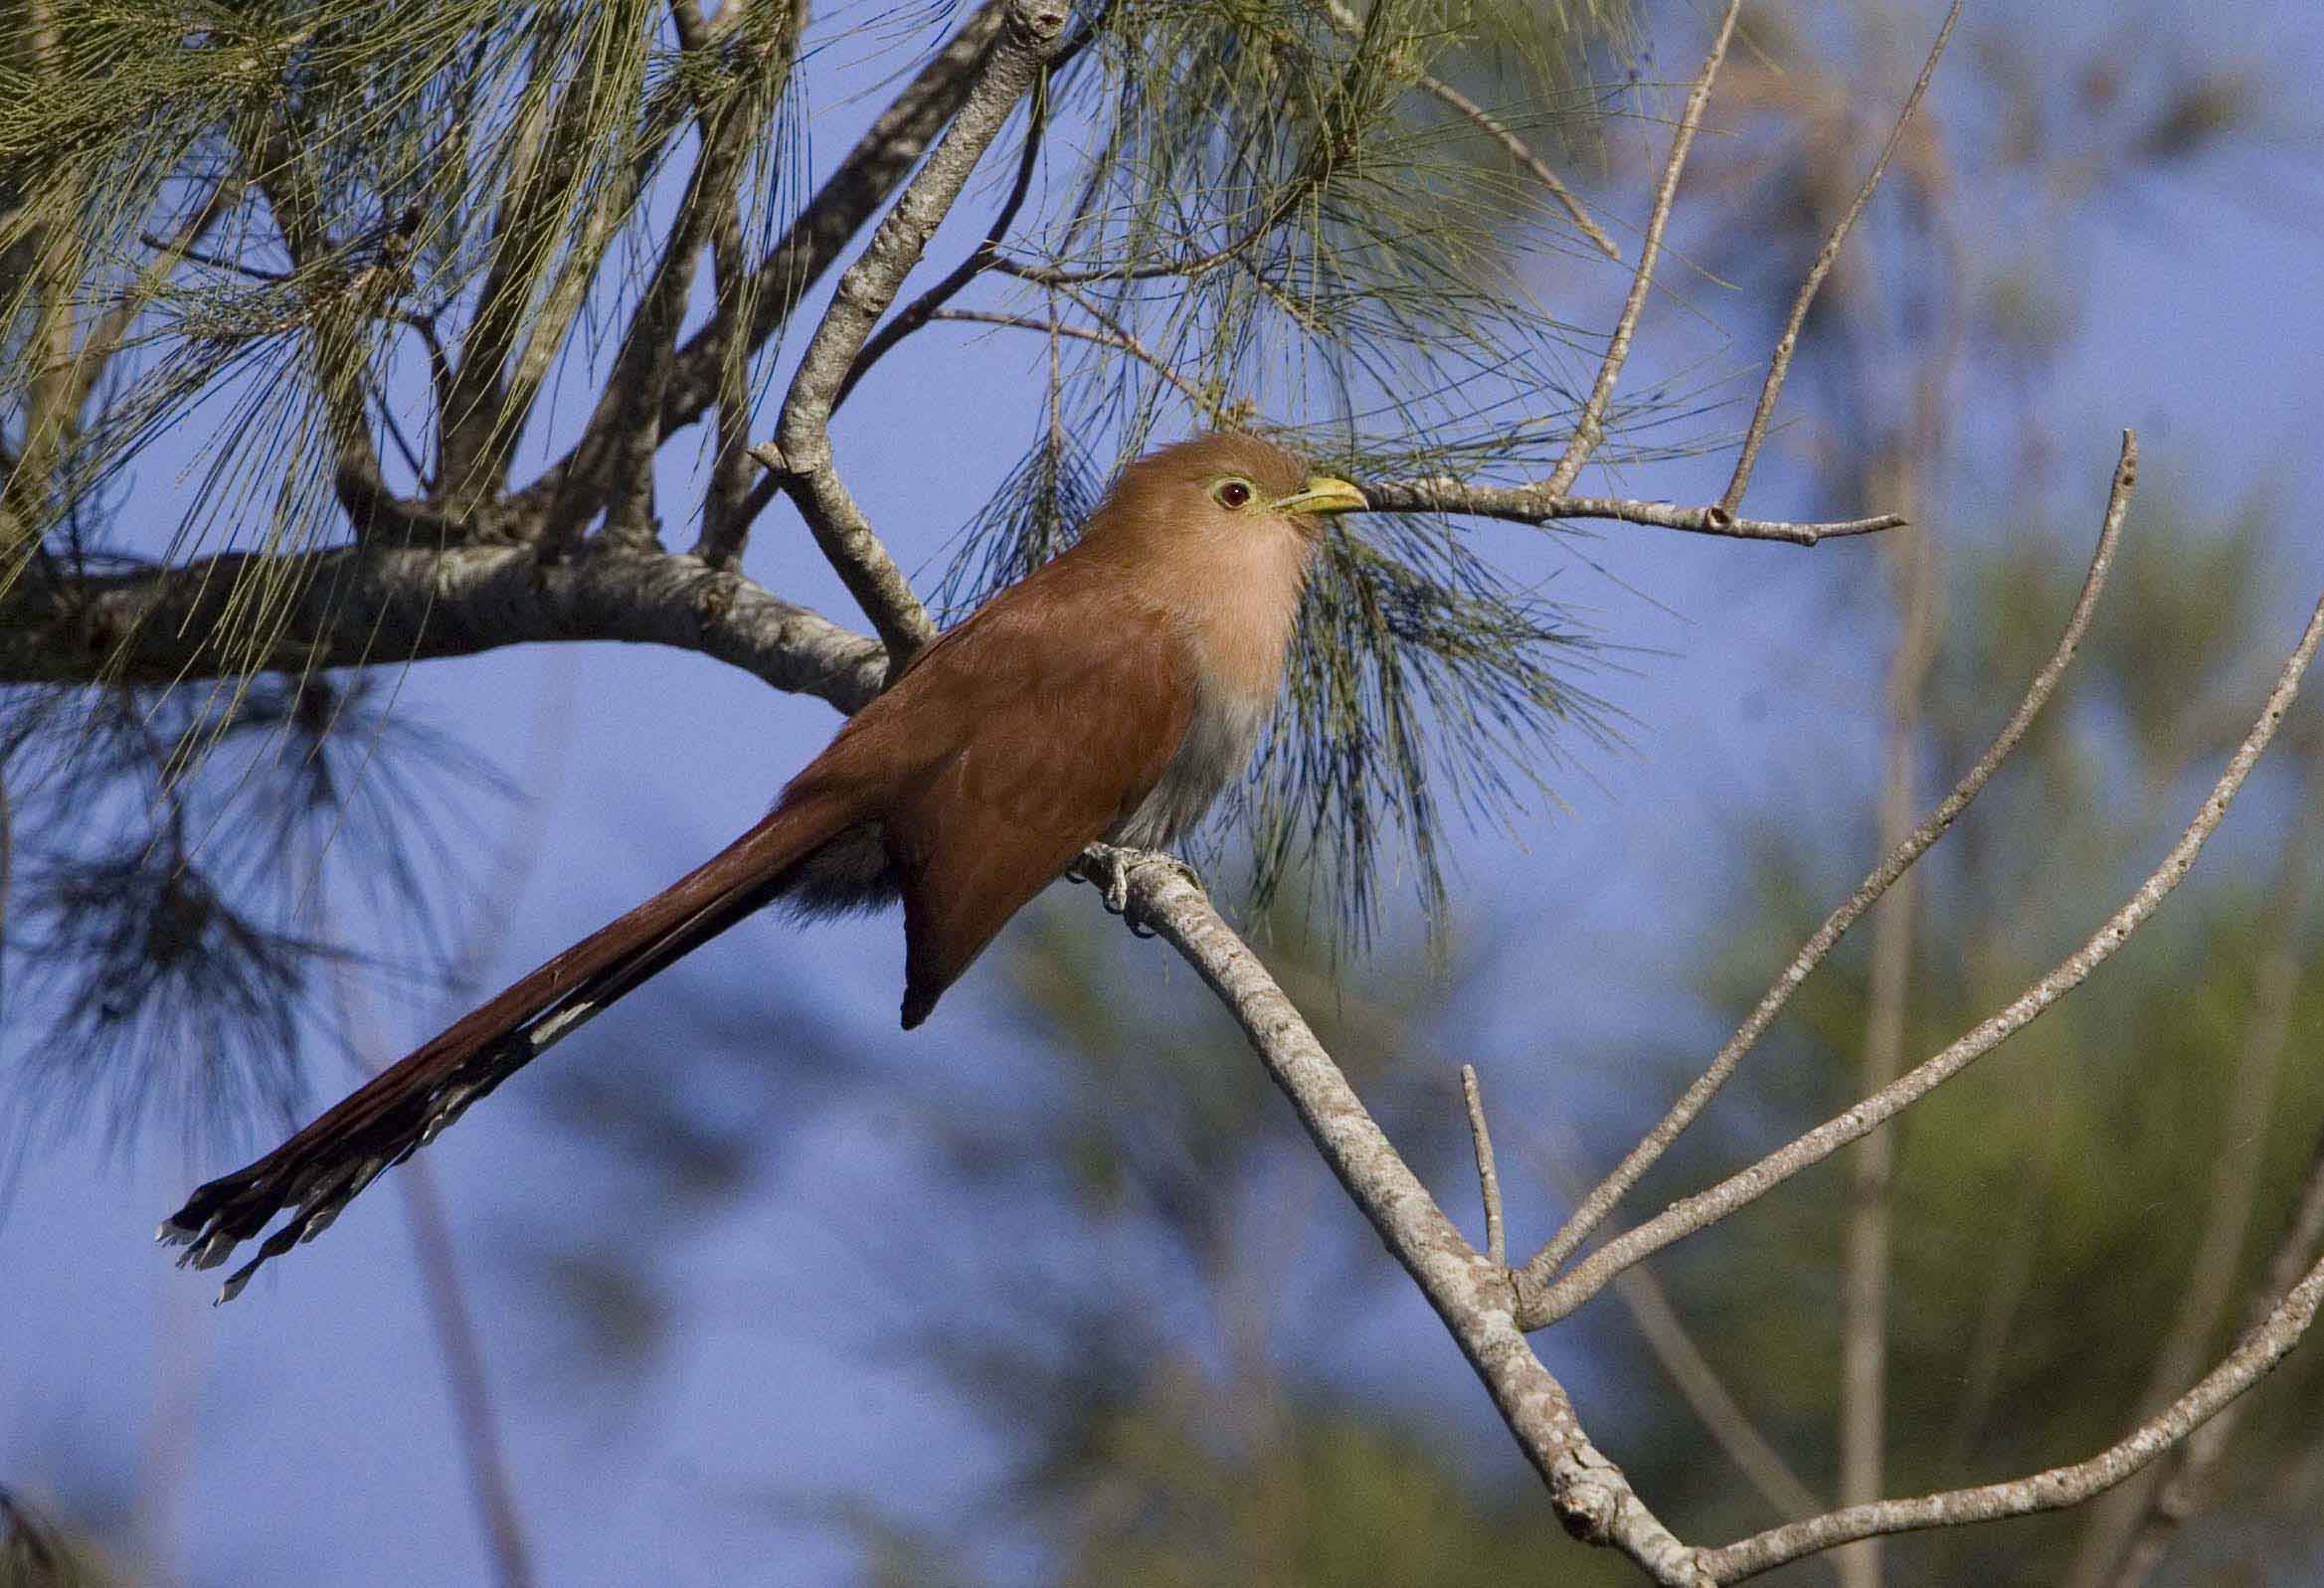 Squirrel Cuckoo Costa Rica 09 Keith Offord